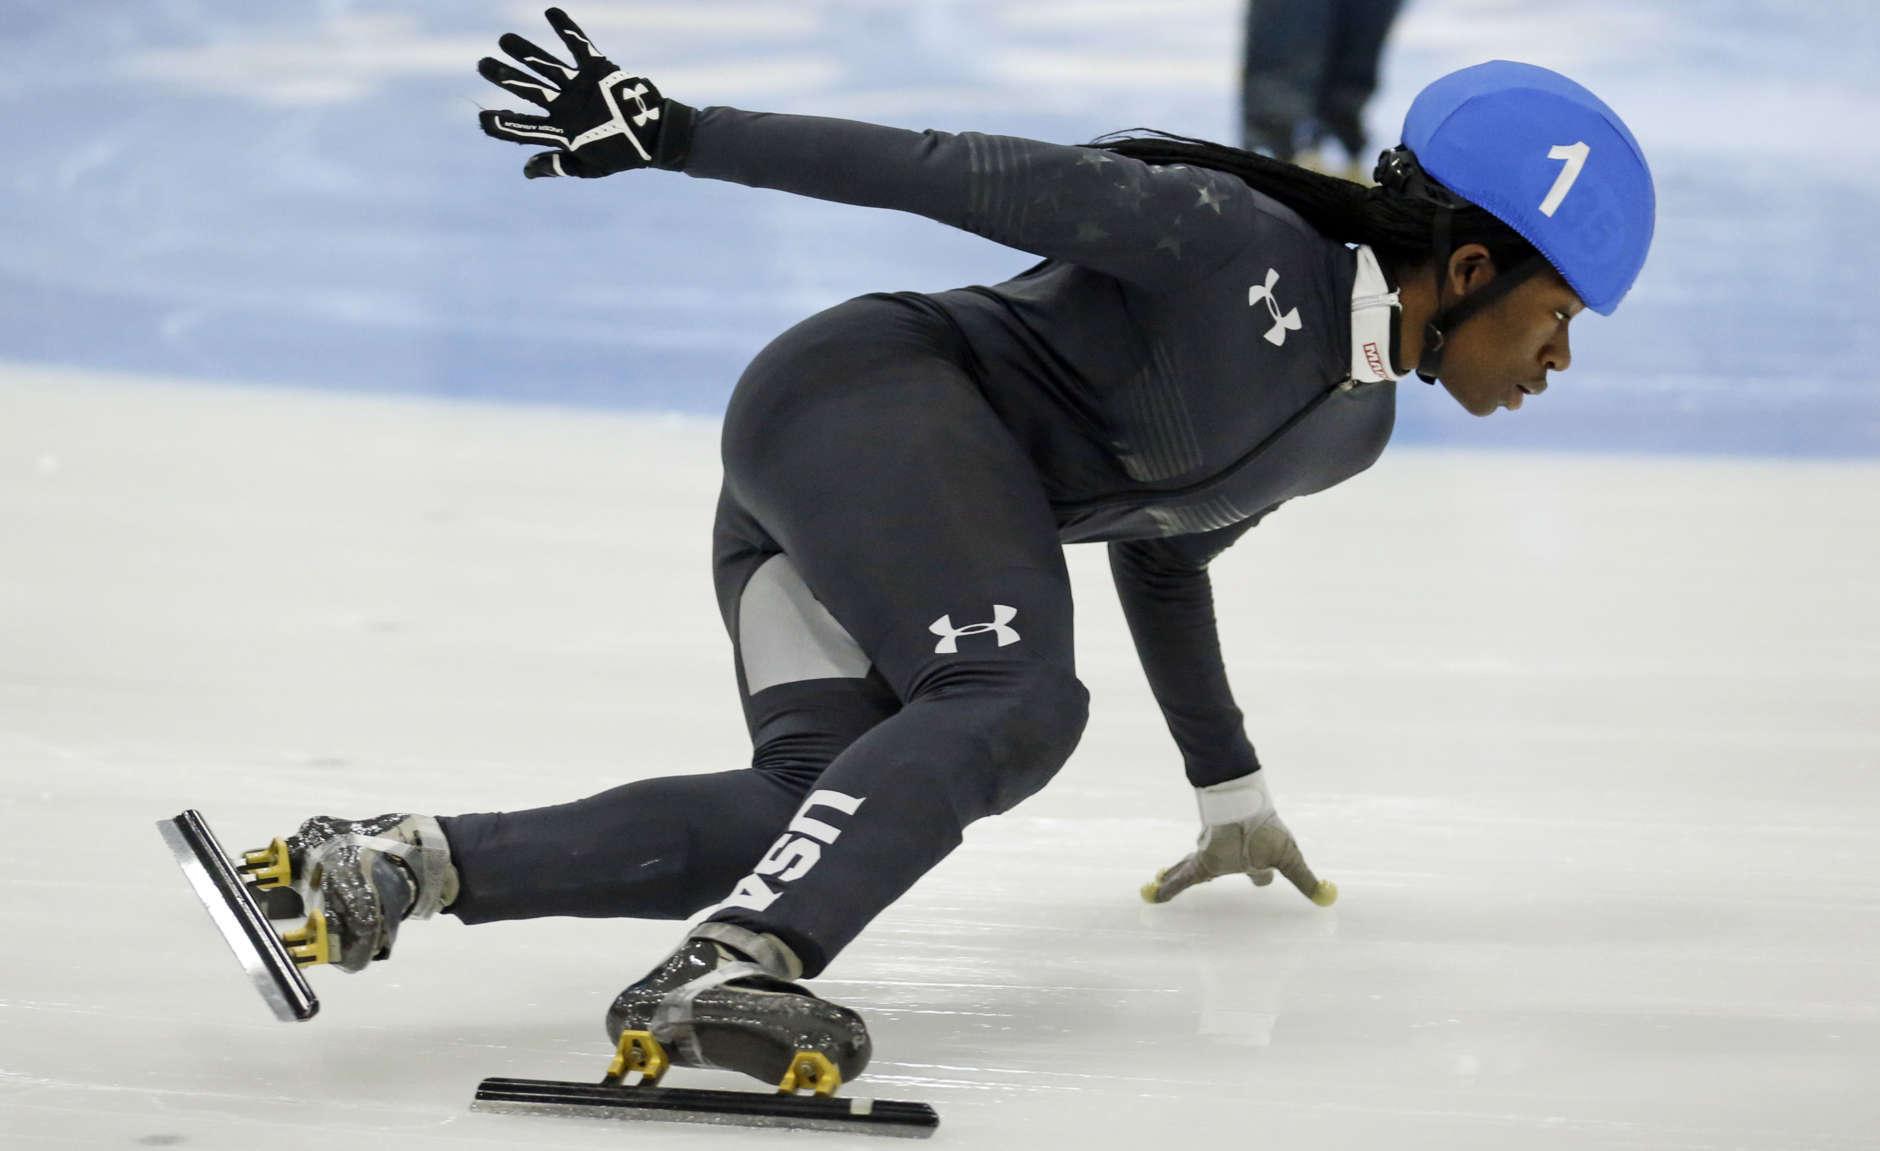 Maame Biney (1) competes in the women's 500-meter A final race during the U.S. Olympic short track speedskating trials Saturday, Dec. 16, 2017, in Kearns, Utah. (AP Photo/Rick Bowmer)